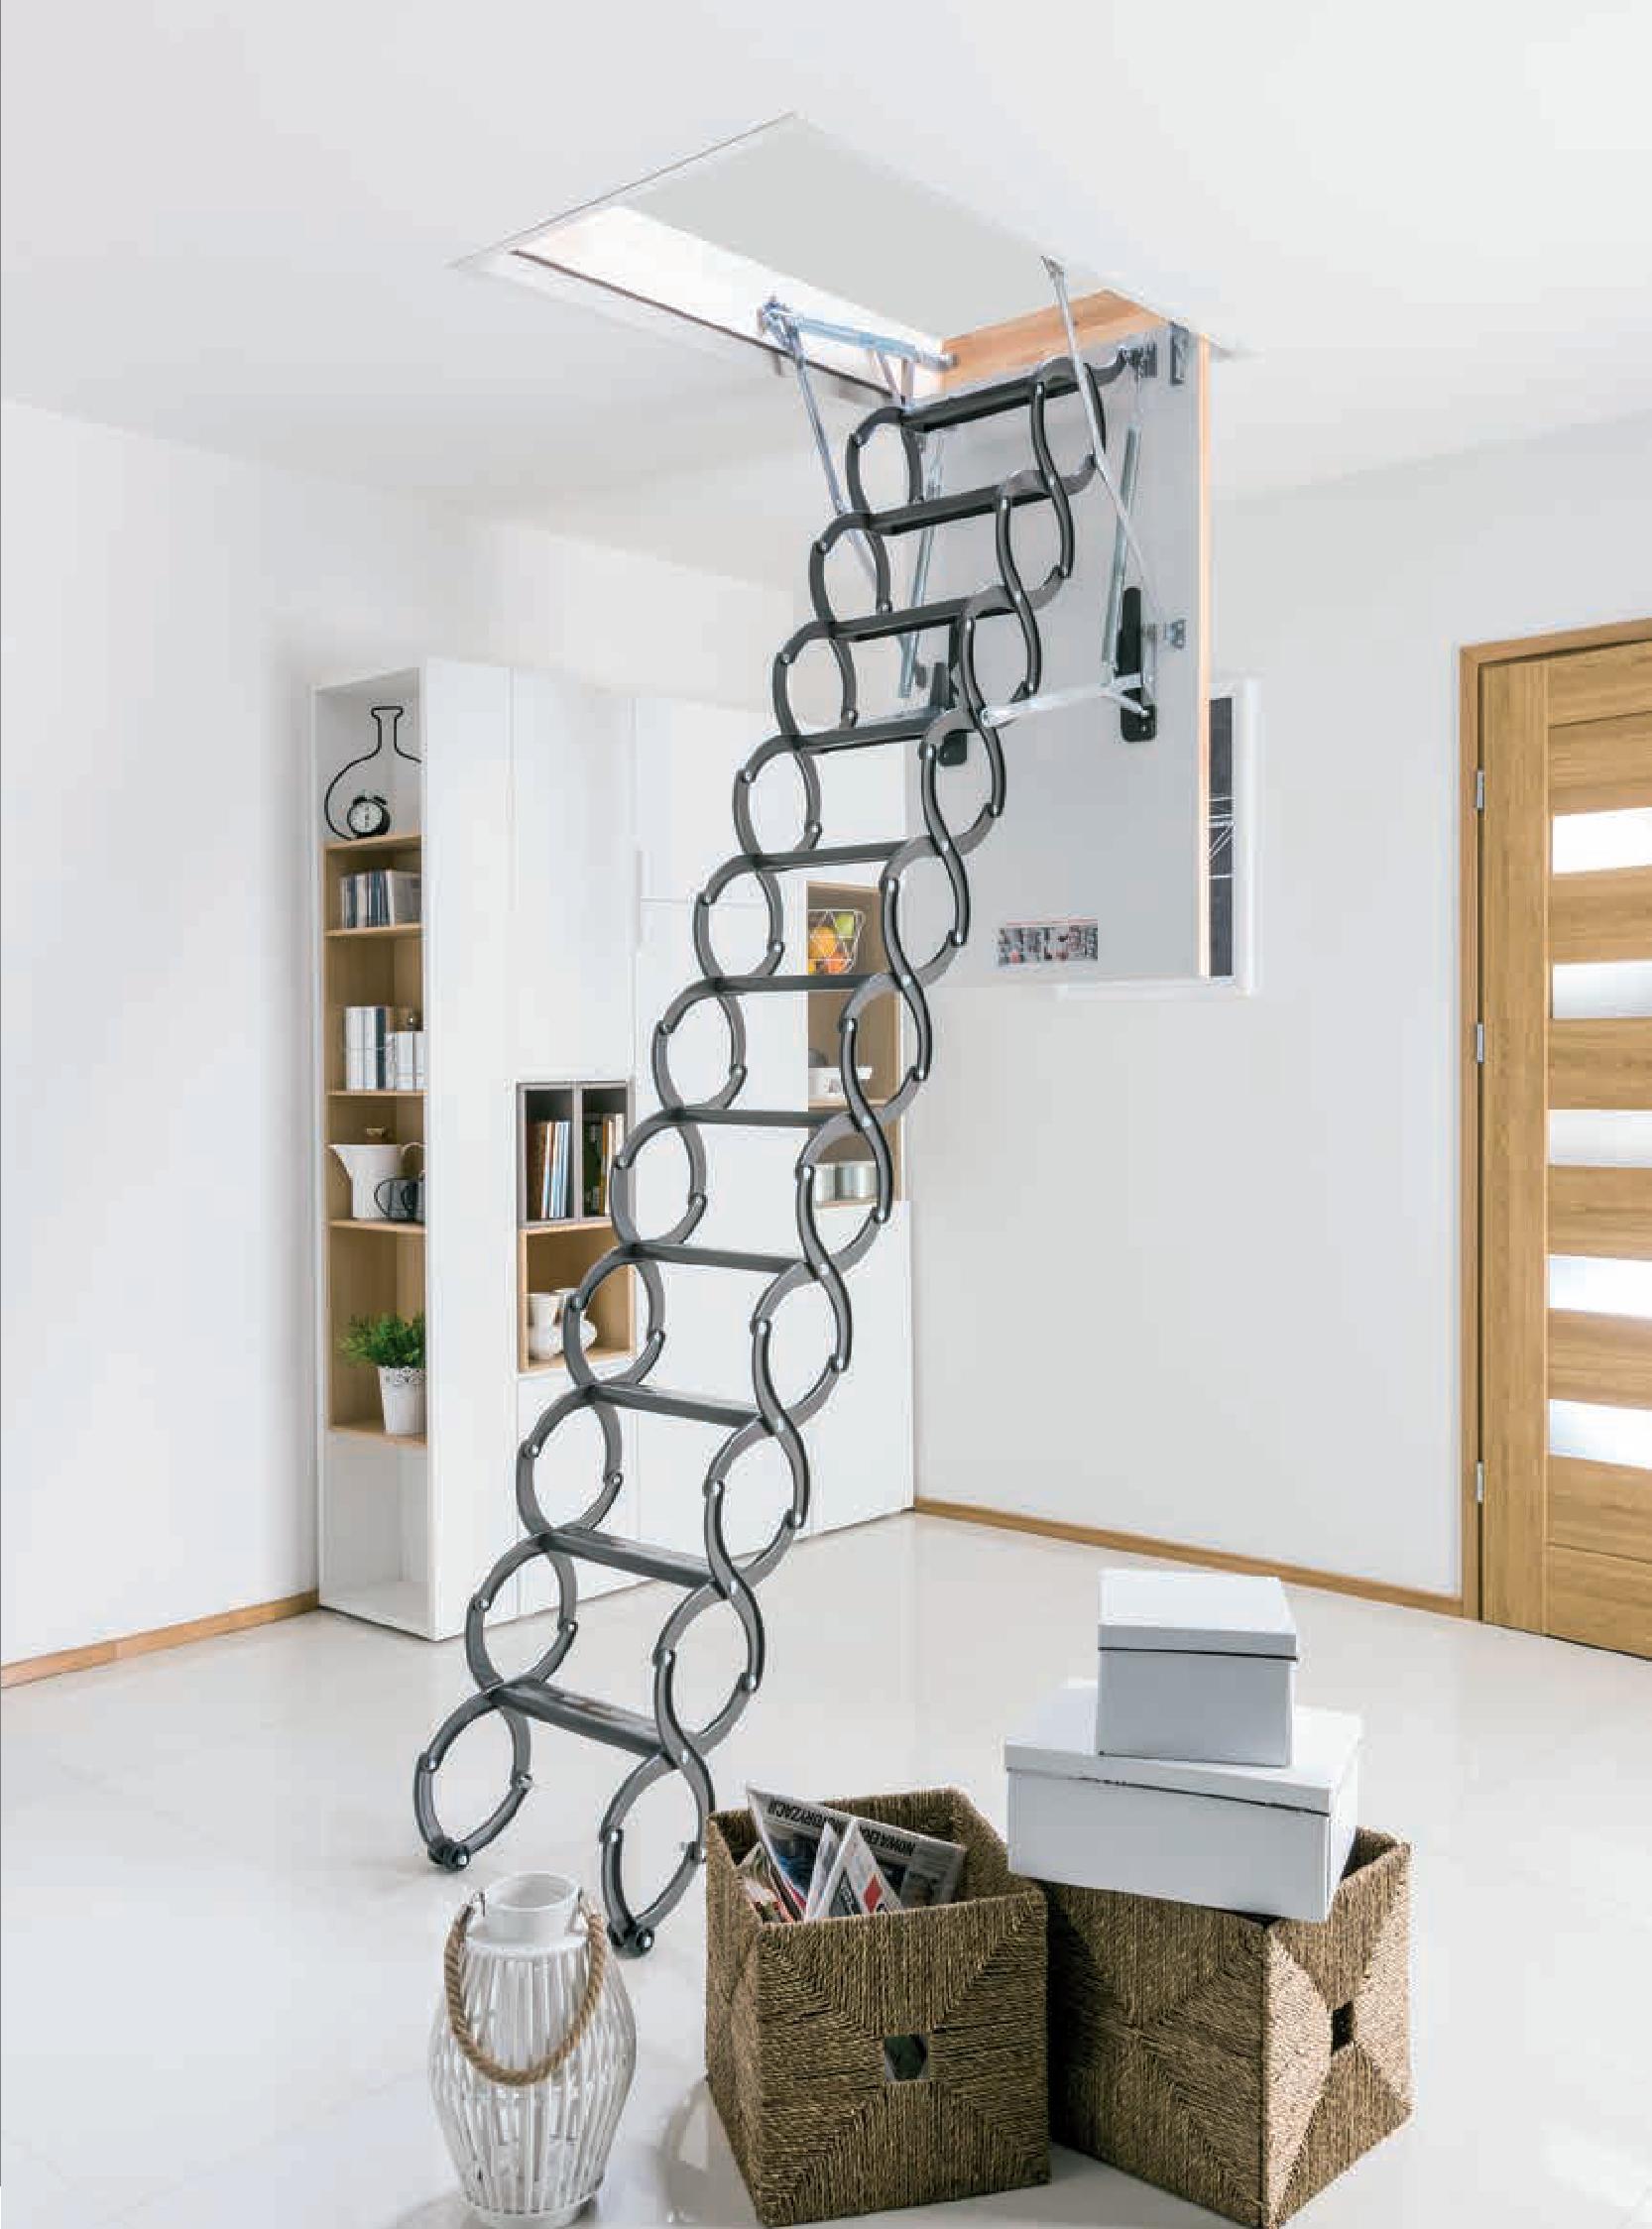 Fakro Scissors Loft Ladder Attic Stairs Loft Ladder Attic Ladder